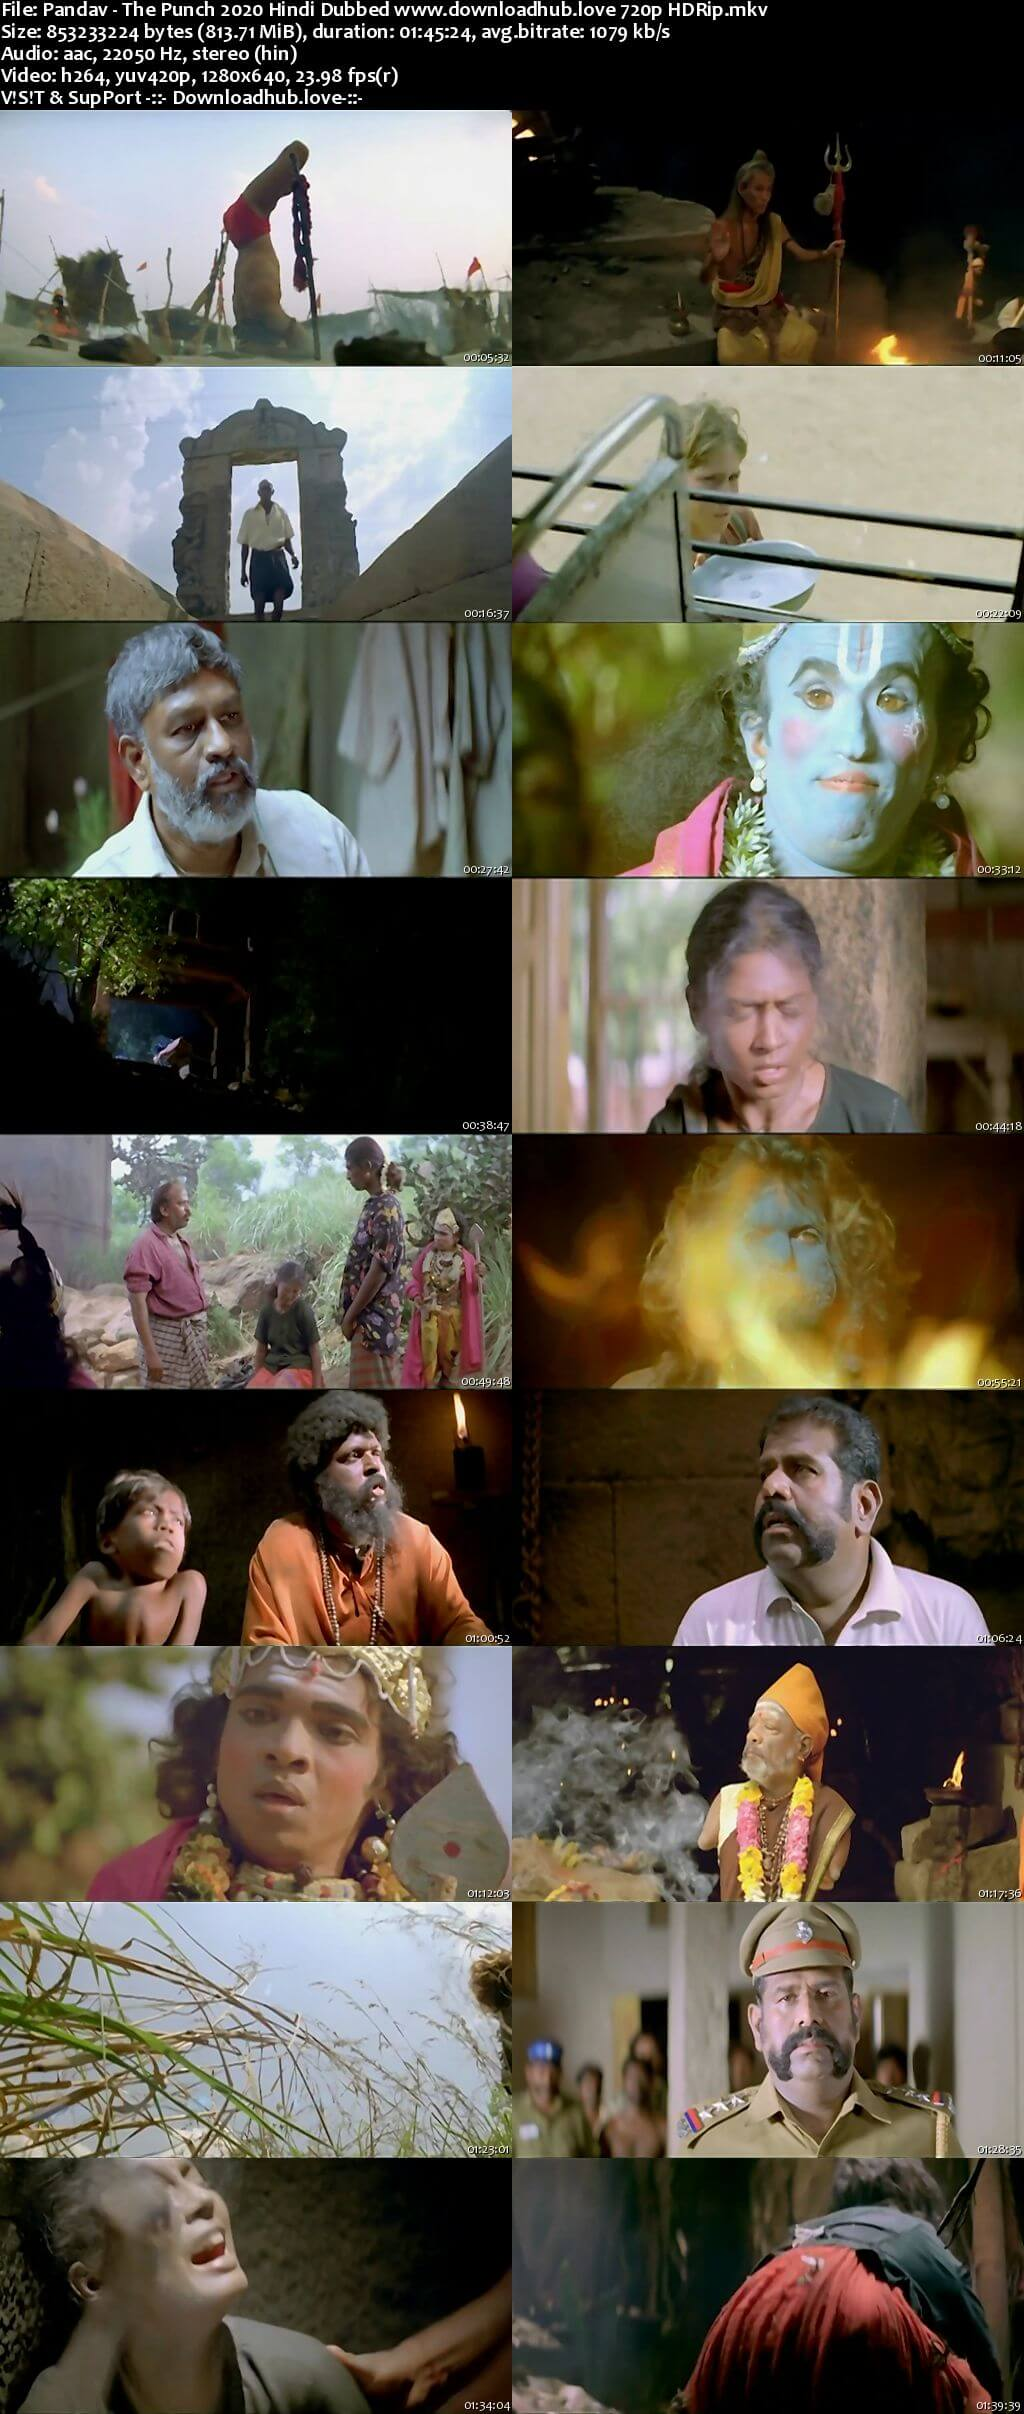 Pandav The Punch 2020 Hindi Dubbed 720p HDRip x264